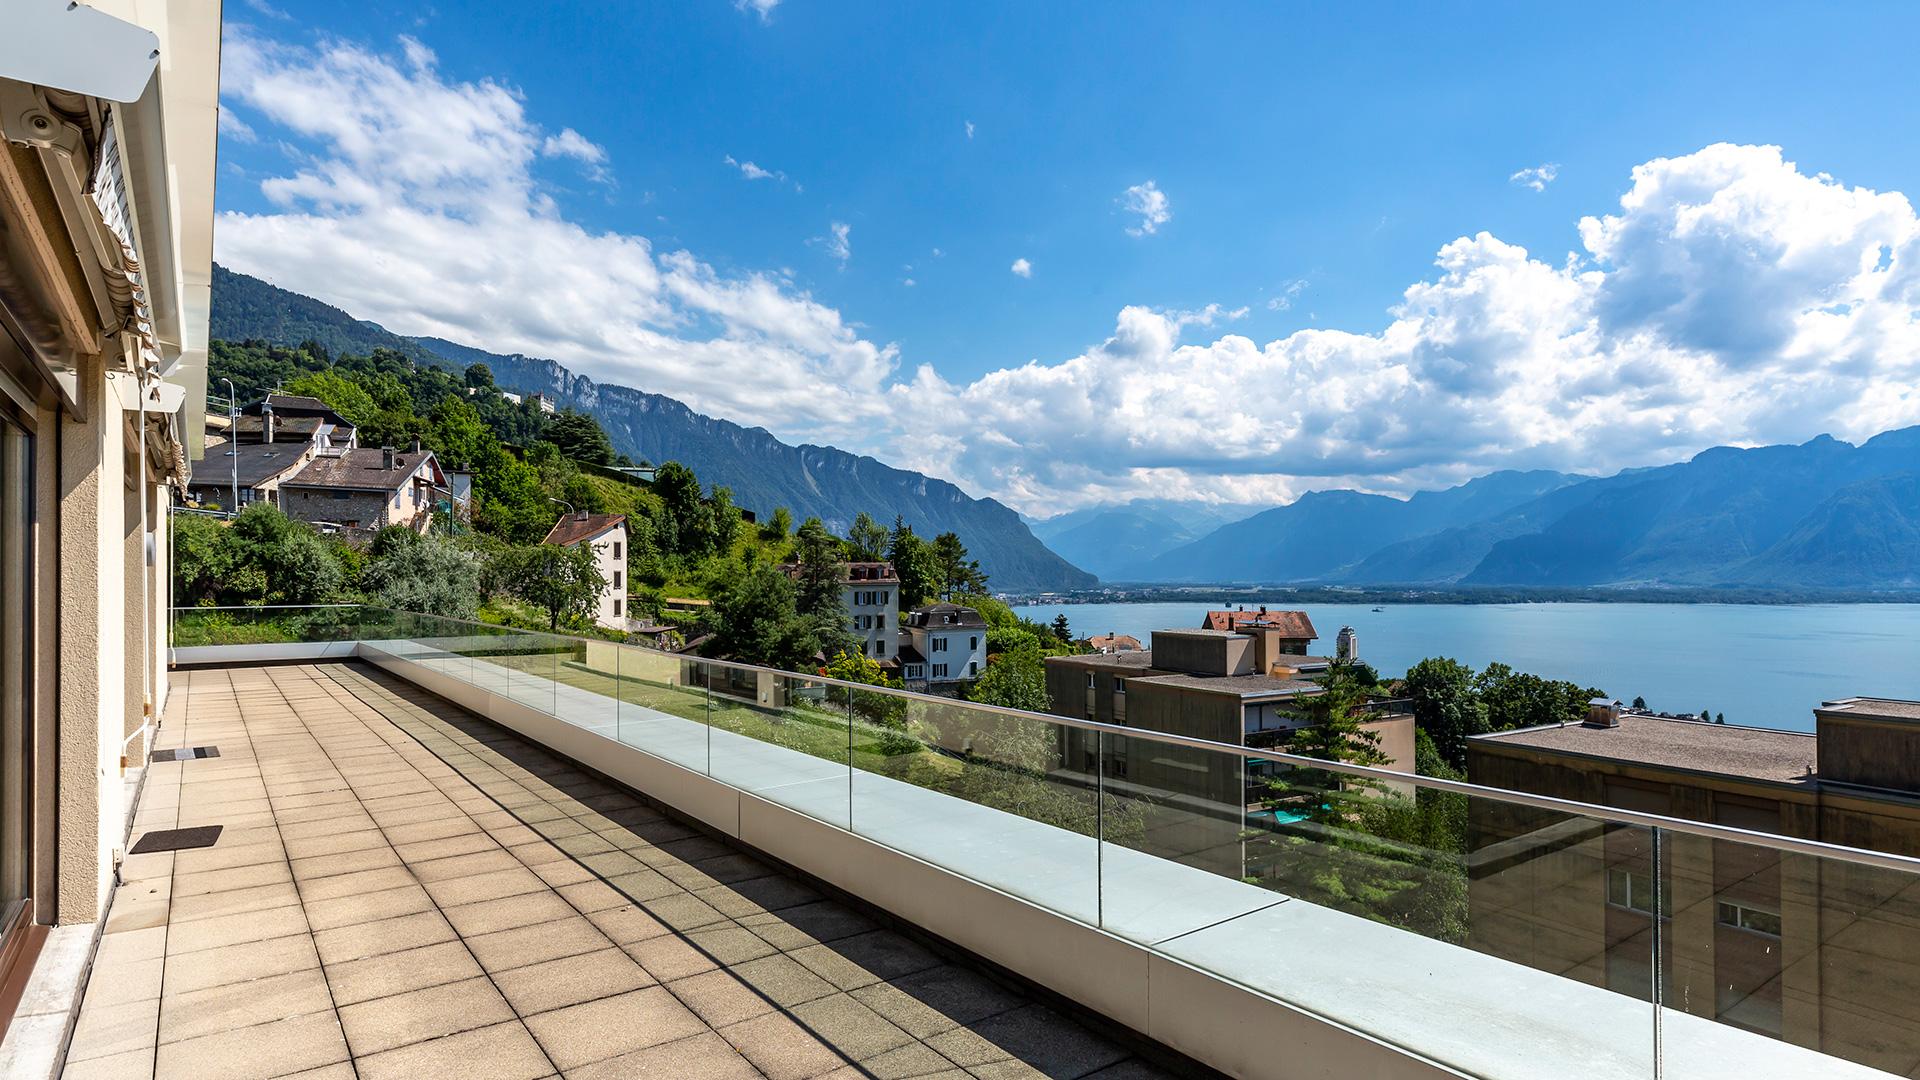 Caudraz Penthouse Apartments, Switzerland